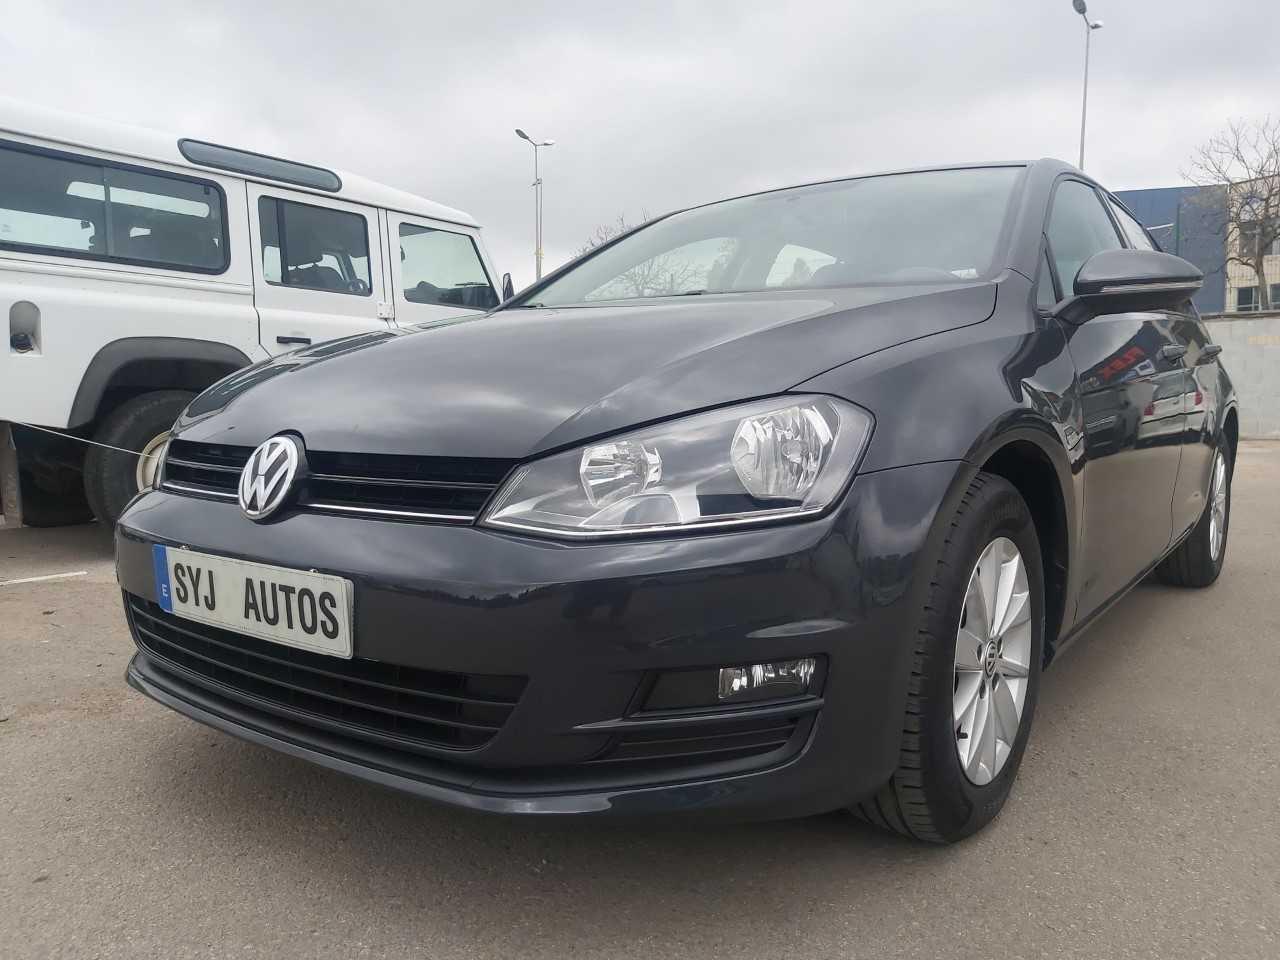 Volkswagen Golf Golf Edition 1.2 TSI 105cv BMT   - Foto 1